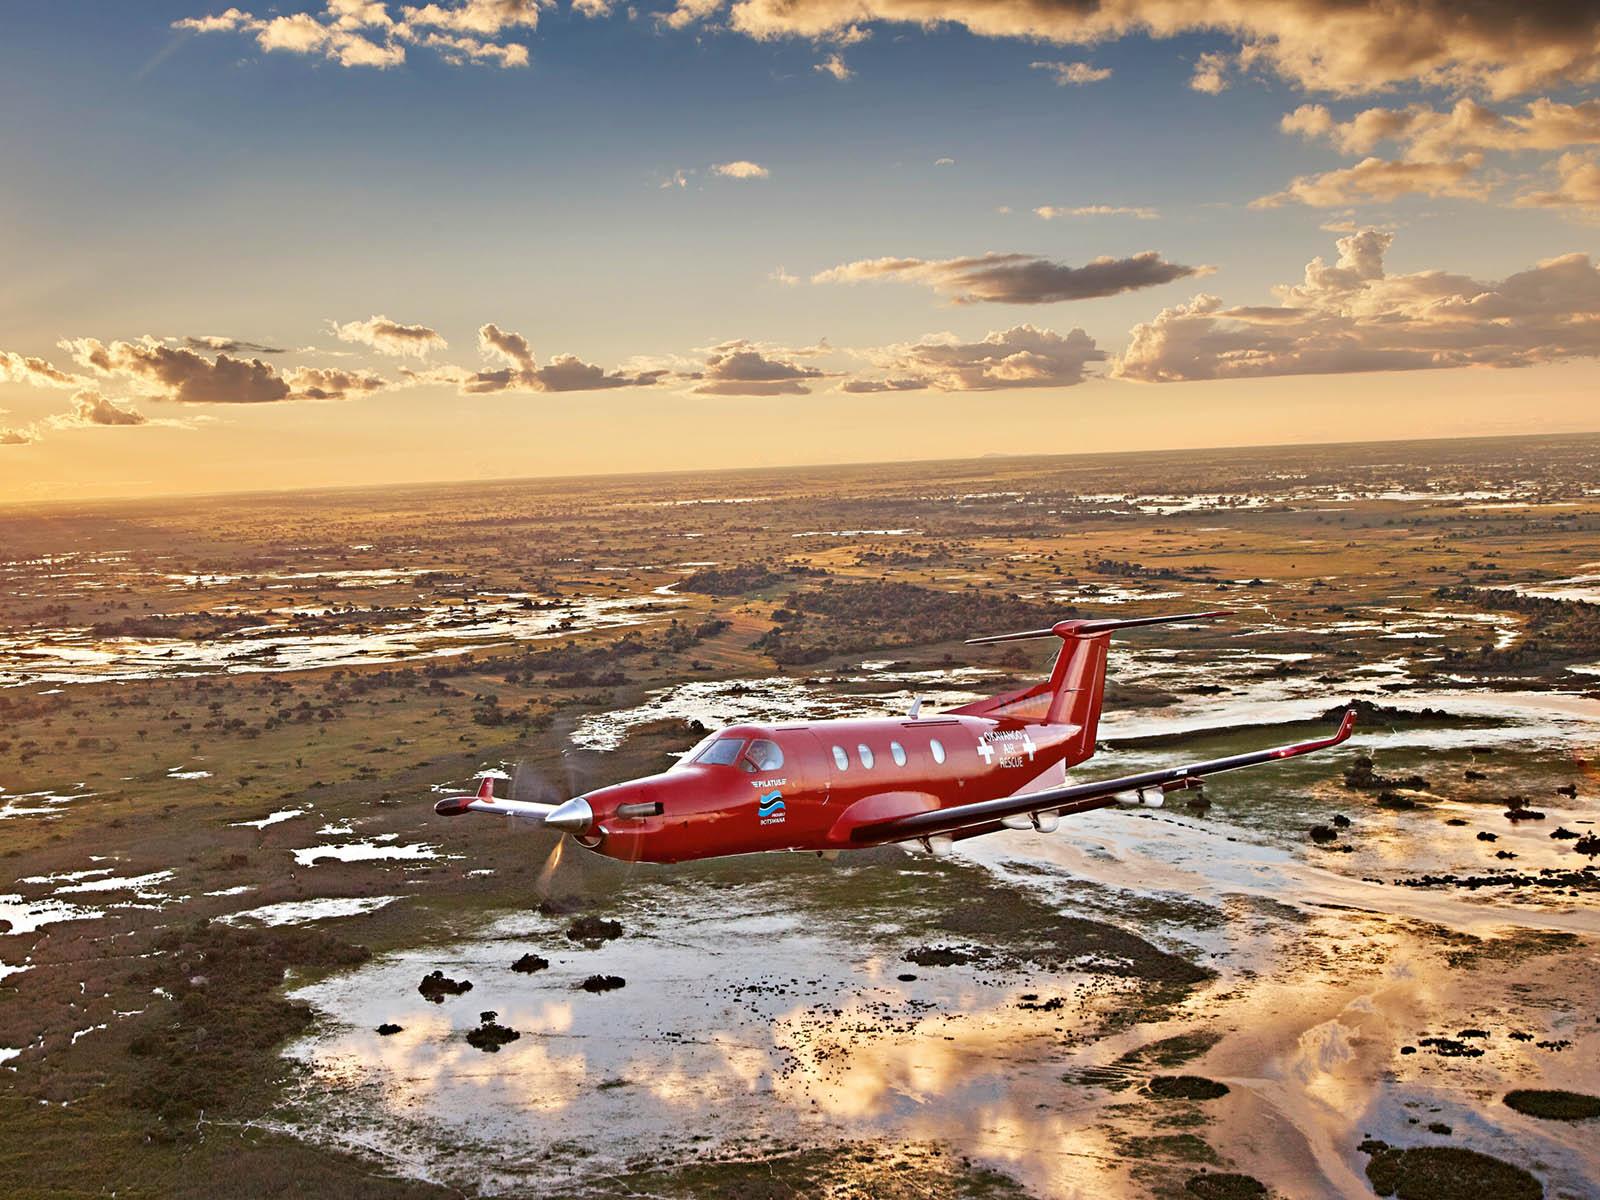 01-751-7761-4187-set-oris-big-crown-propilot-okavango-air-rescue-limited-edition-3.jpg